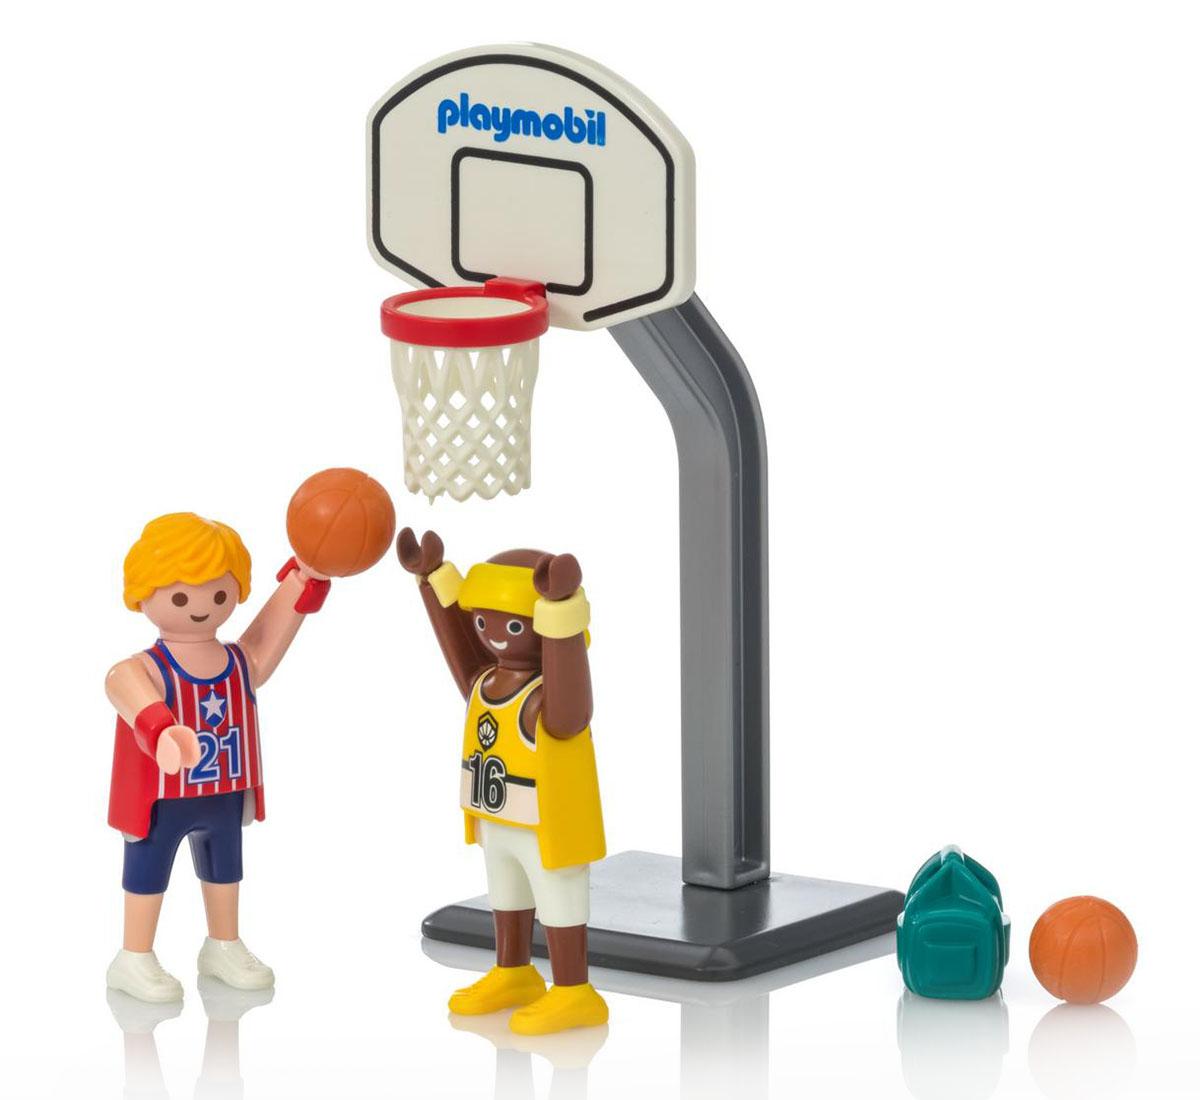 Playmobil Игровой набор Яйцо Баскетбол один